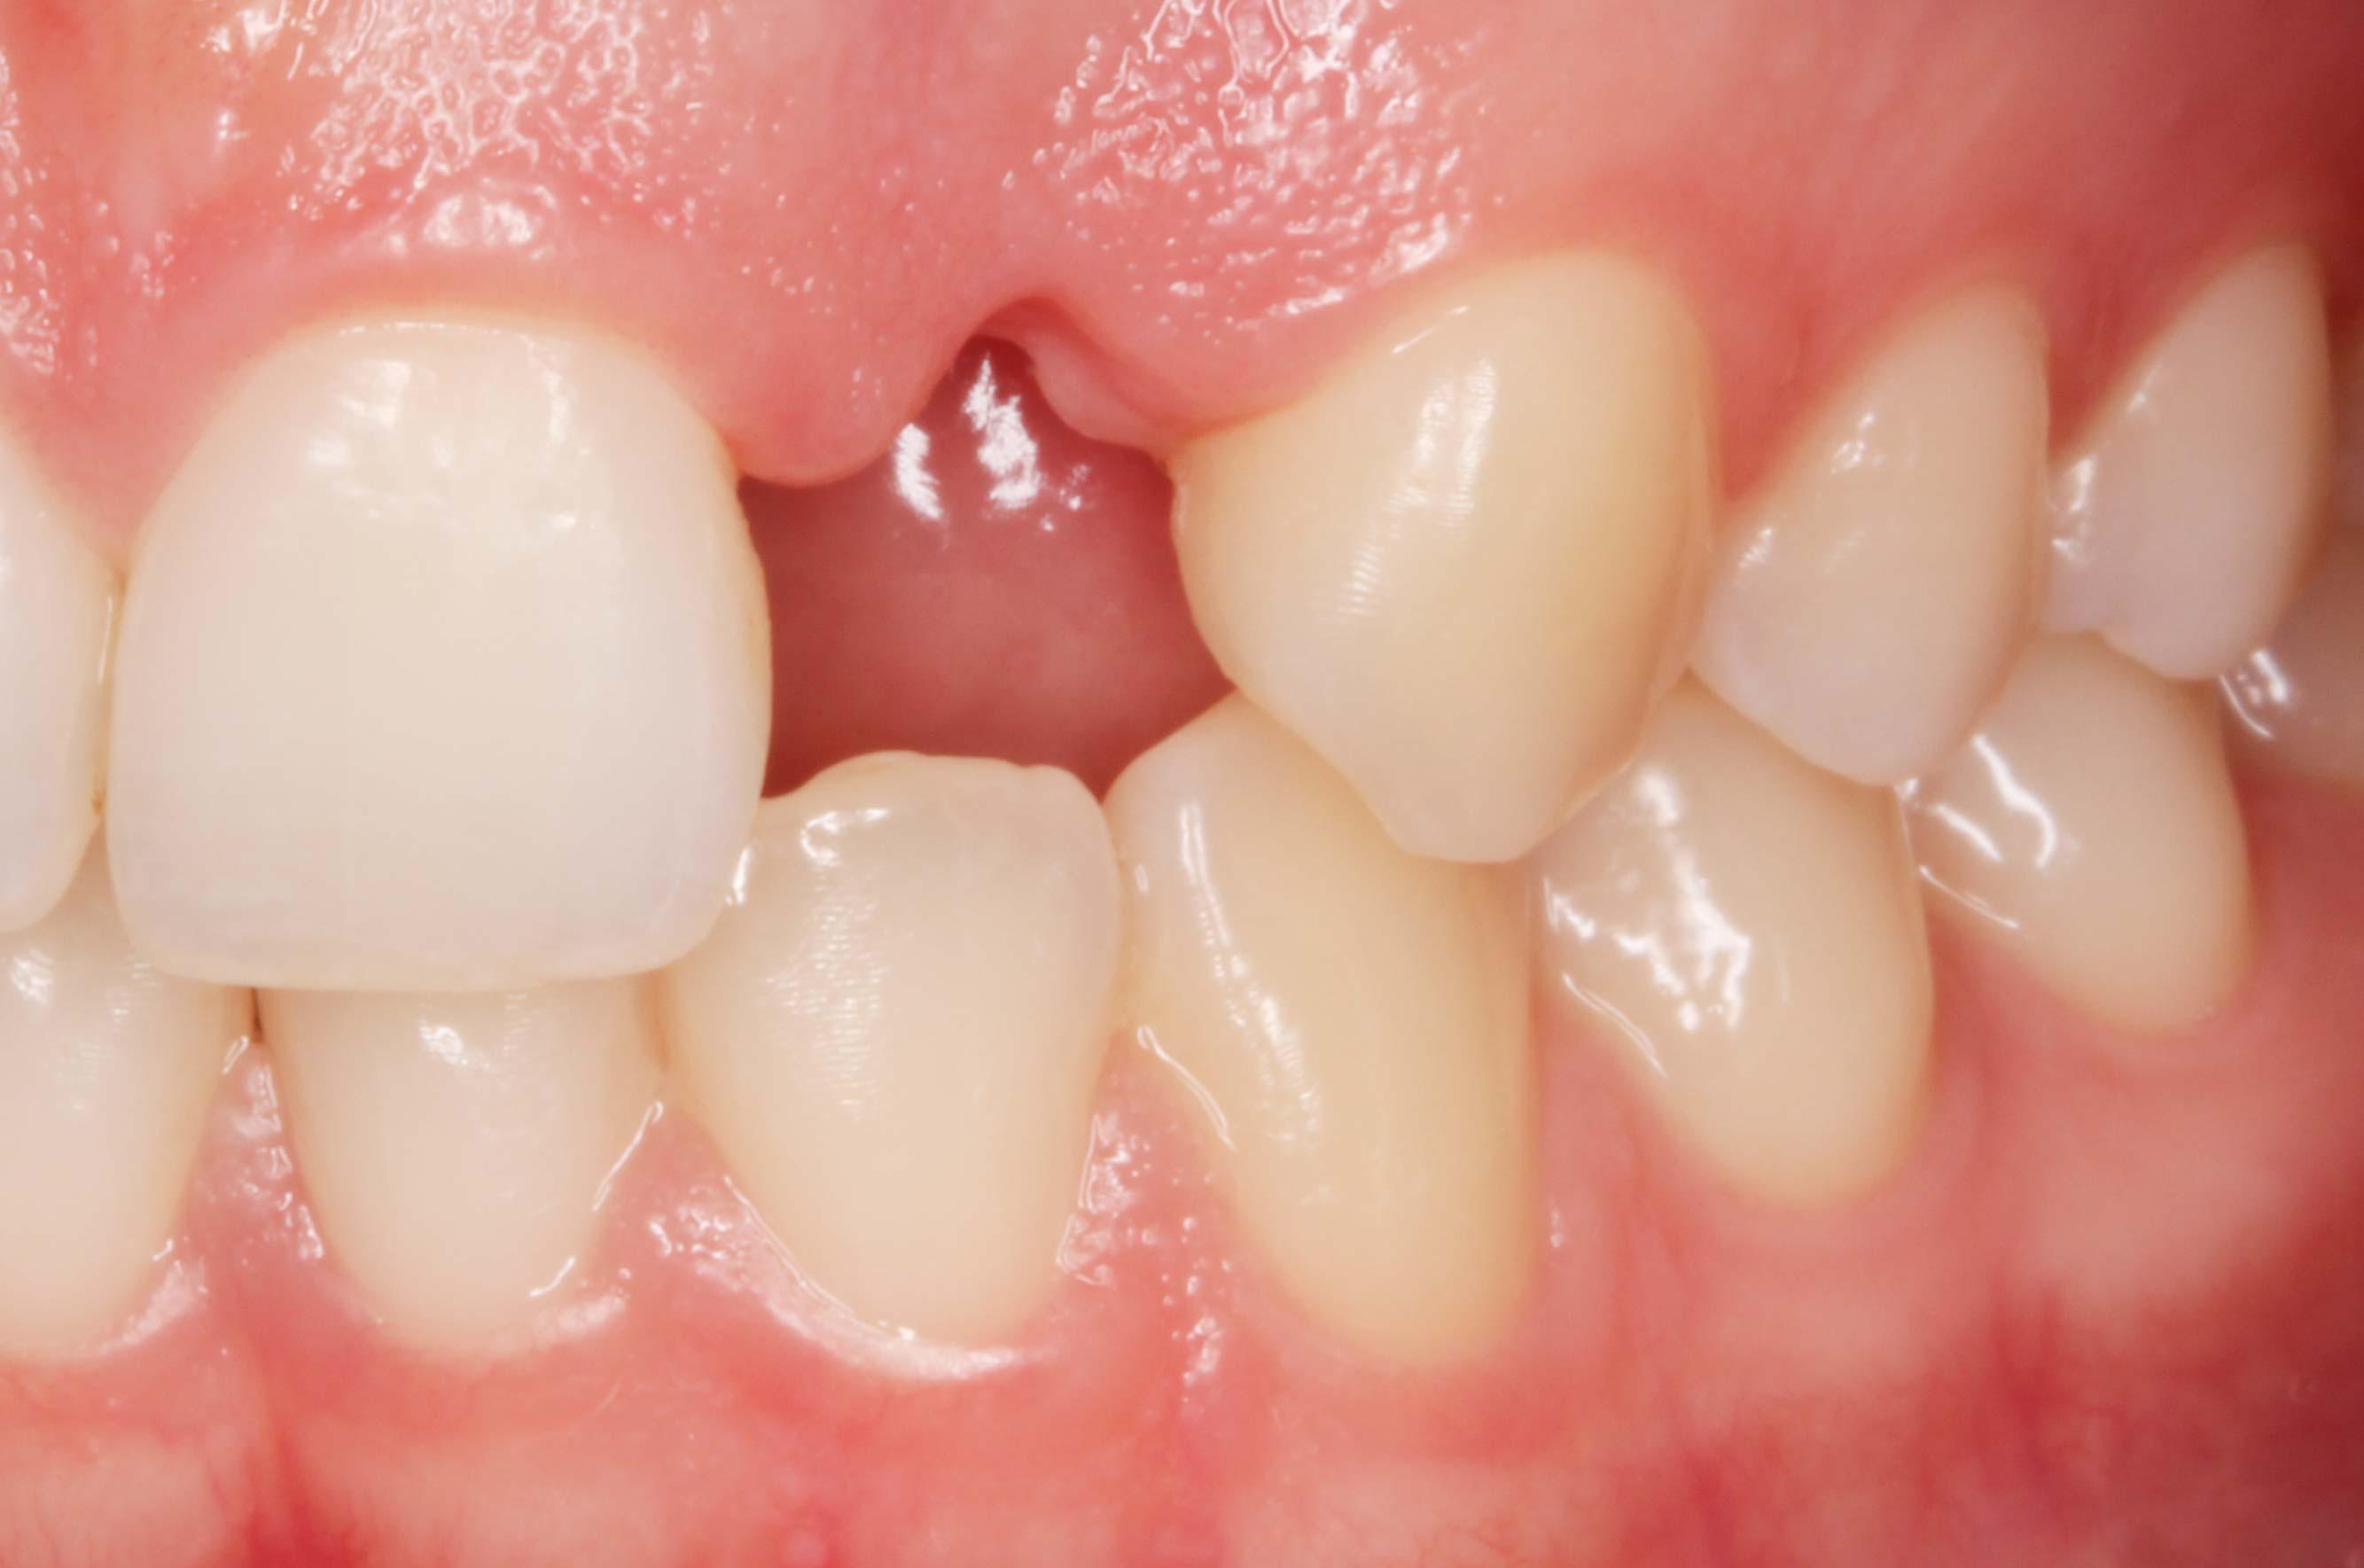 ausencia diente superior